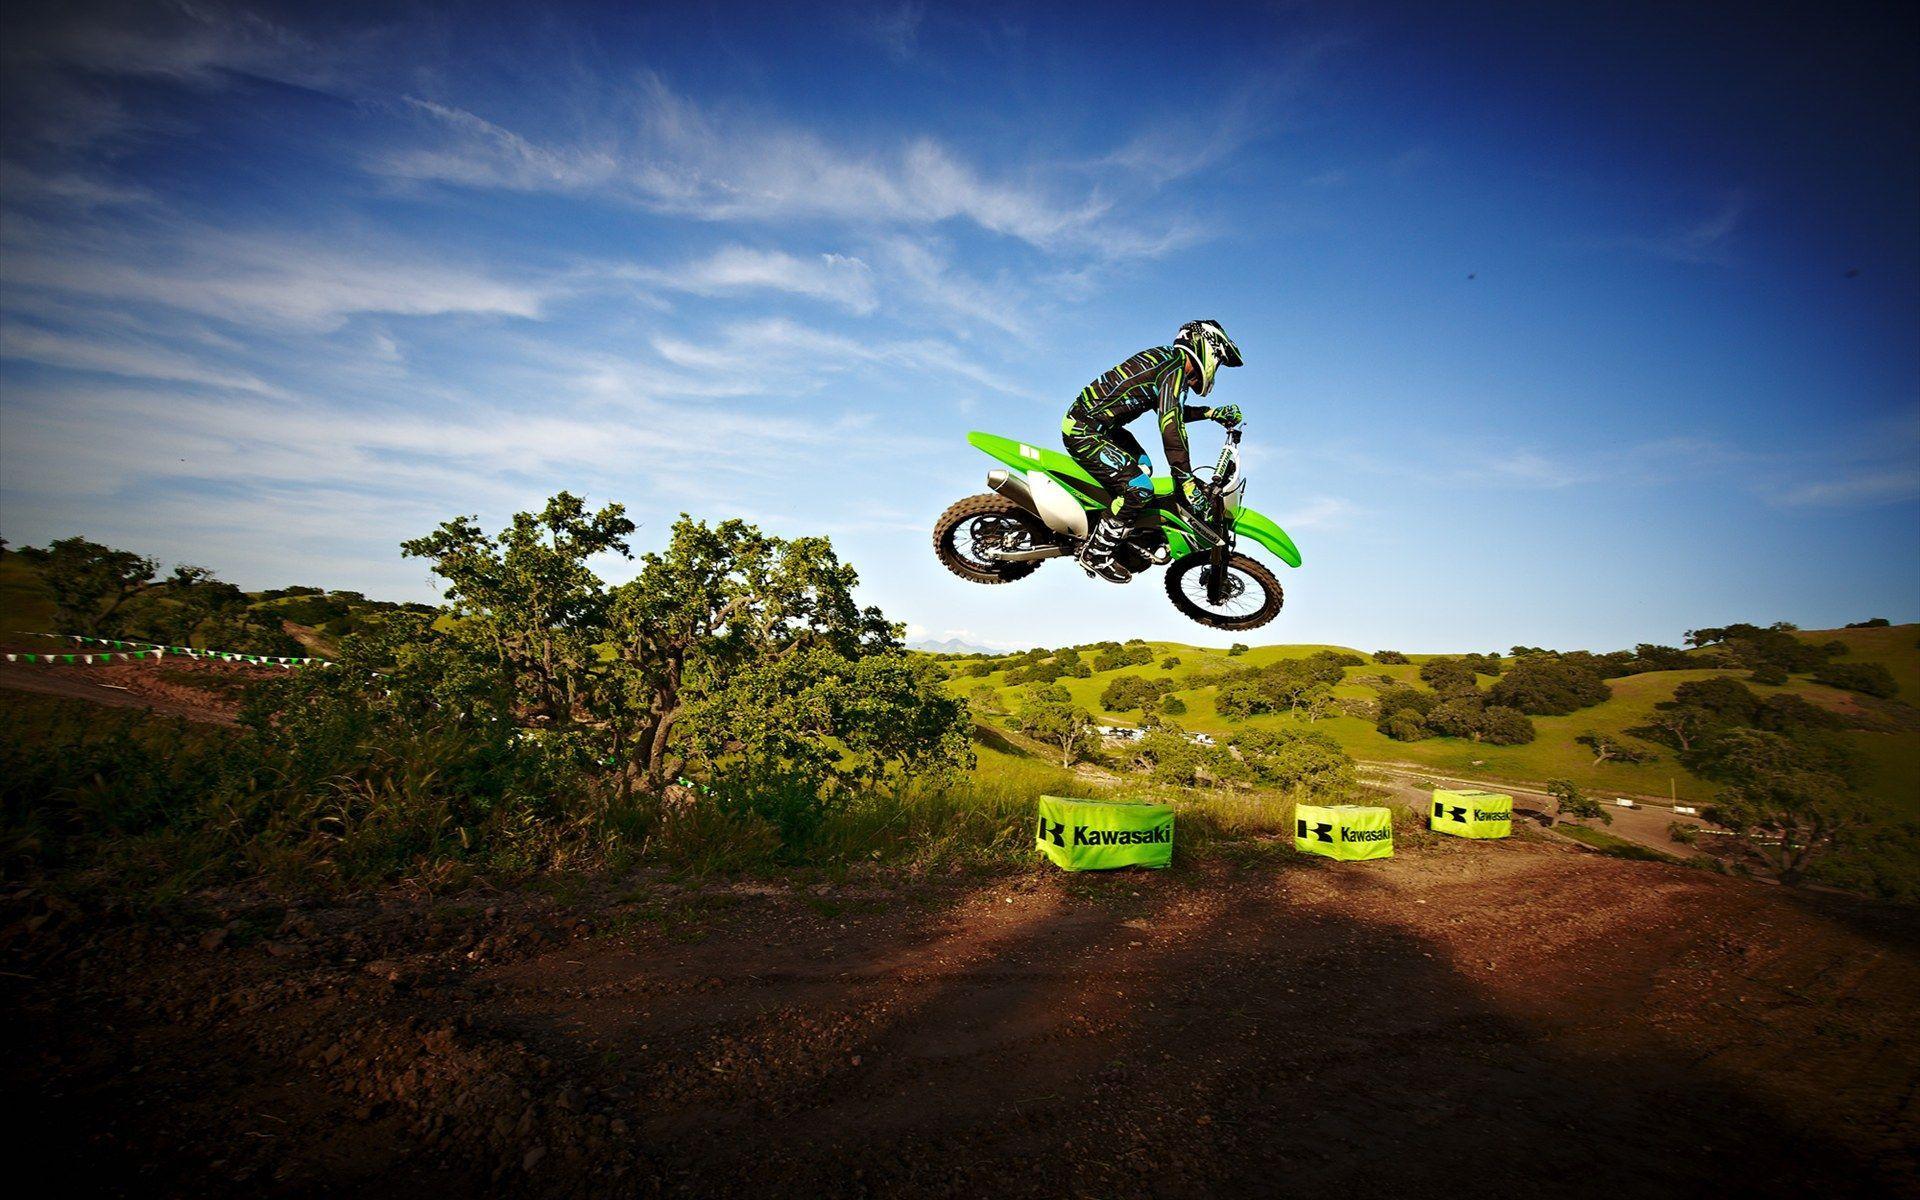 2014x1343 Backgrounds Dirt Bike